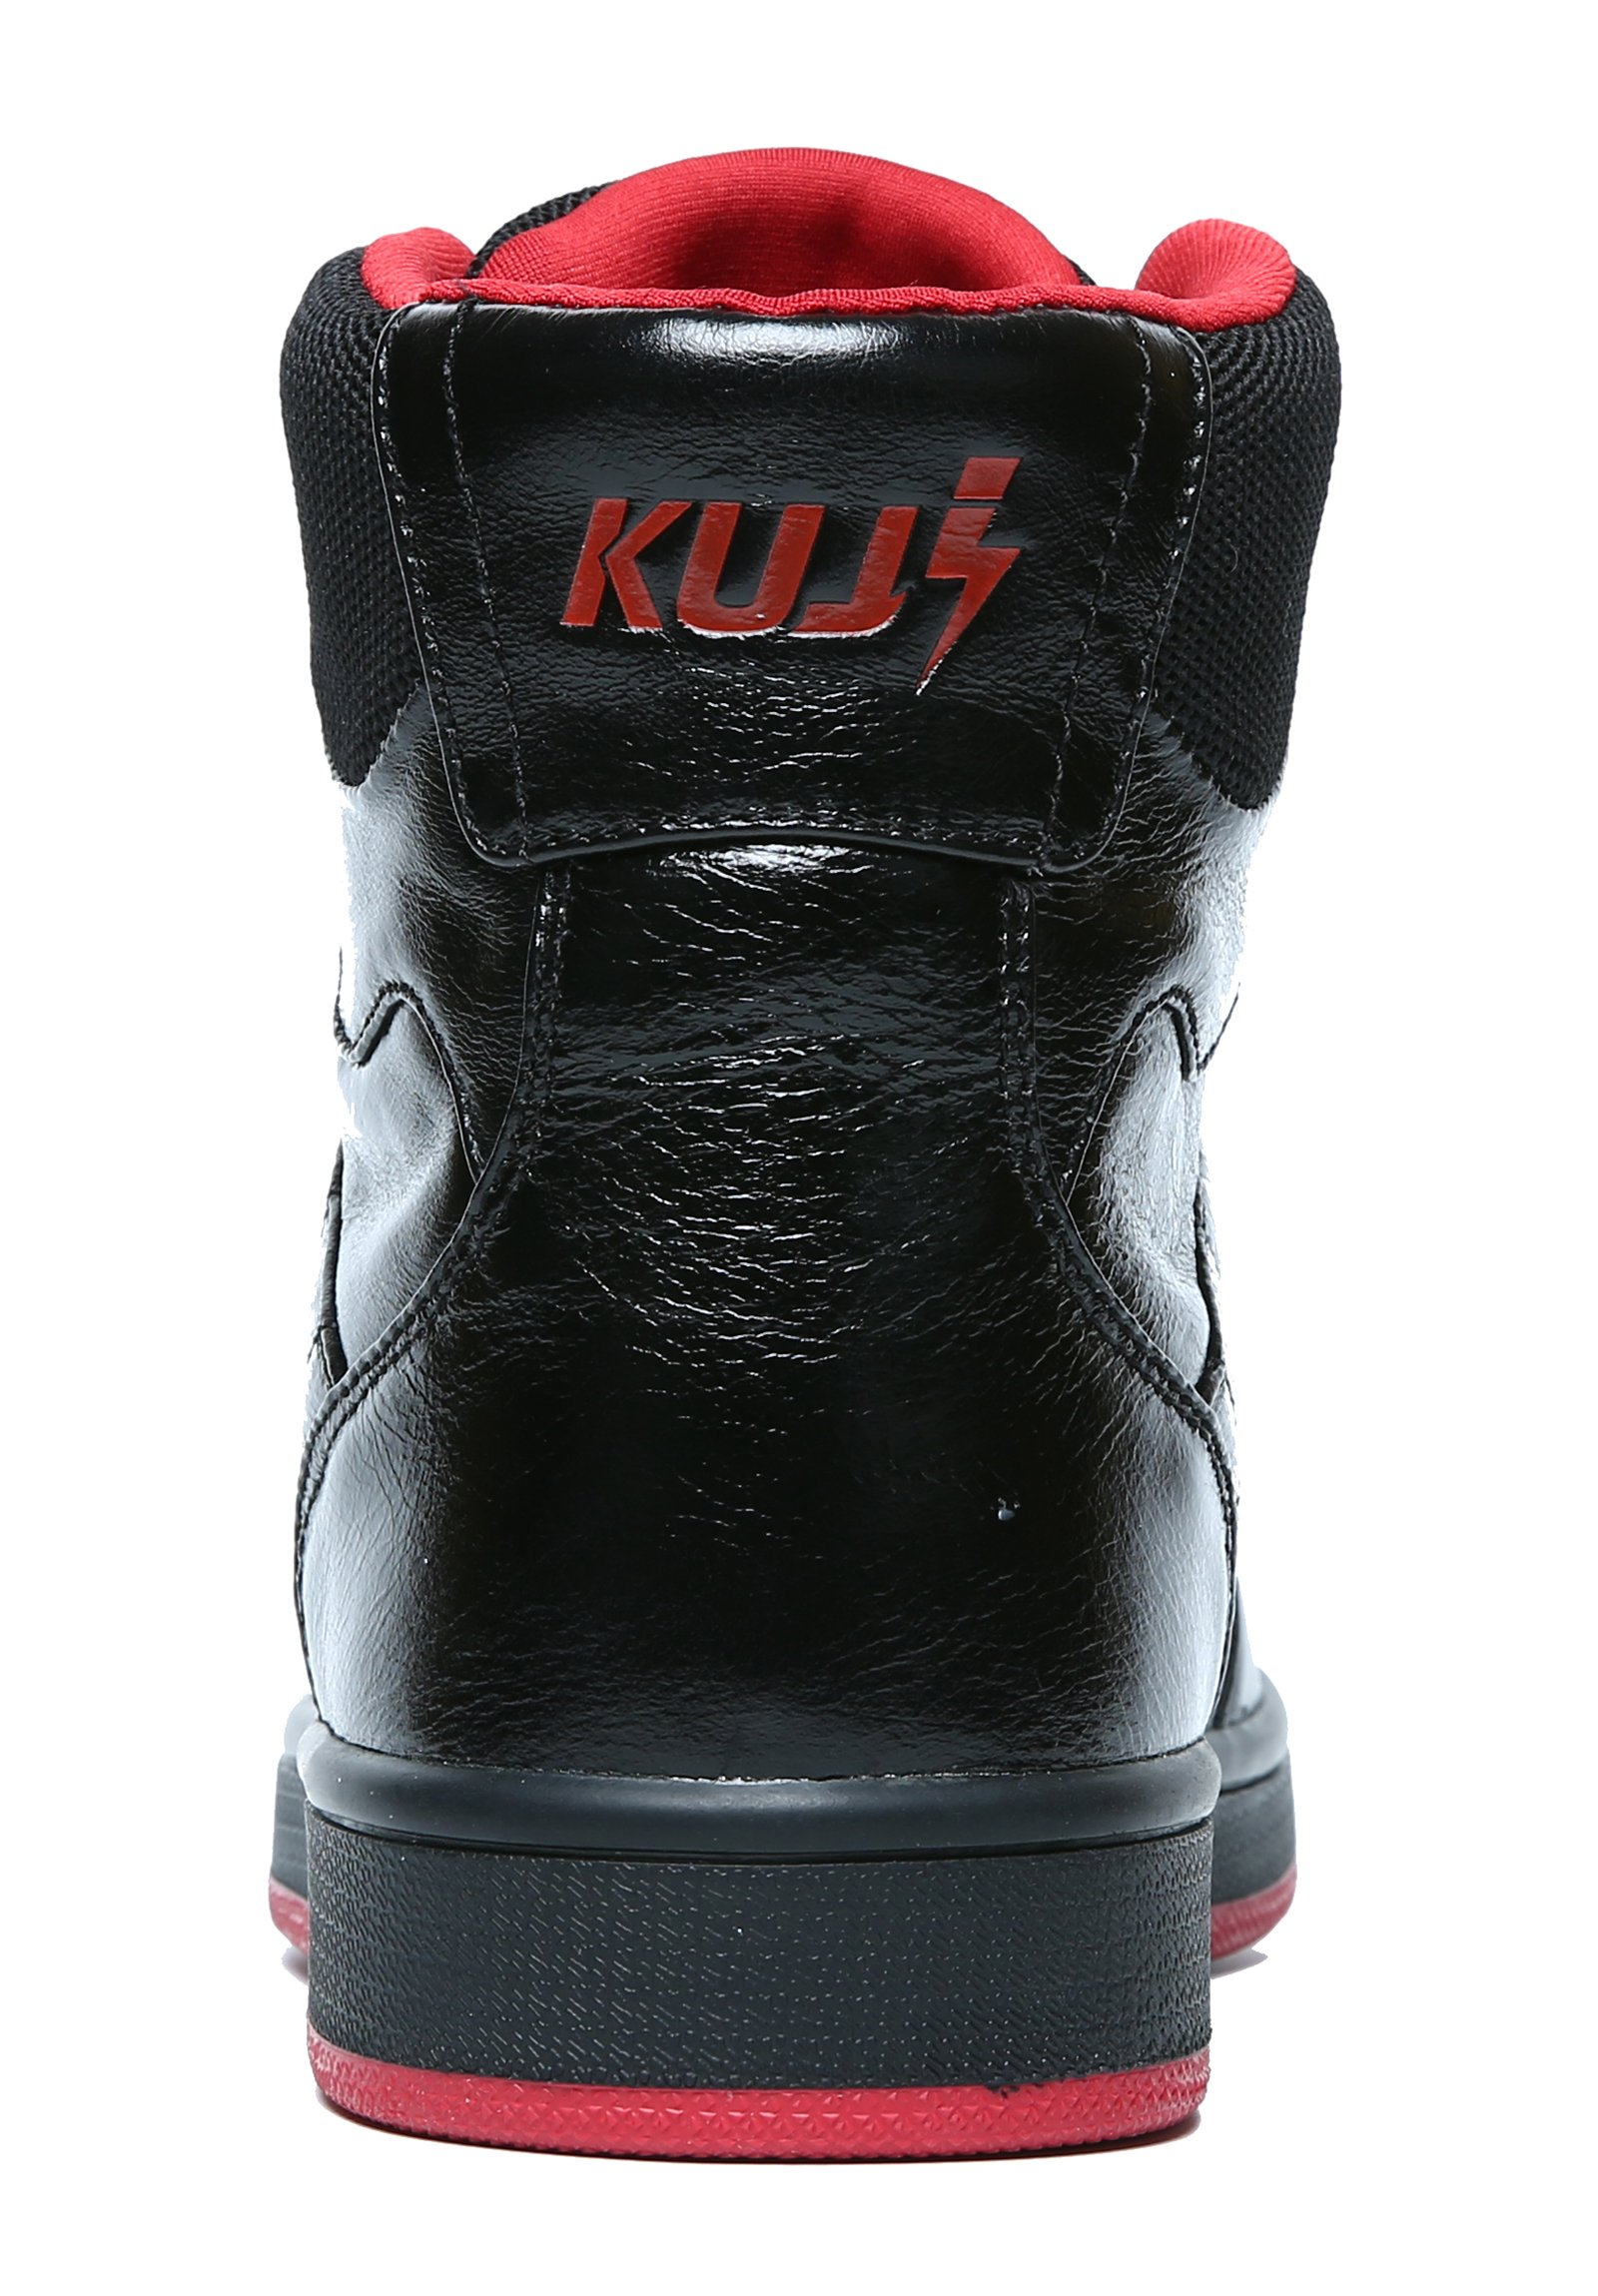 Soulsfeng Men Women High Top Skateboarding Shoes Flat Lace Up Cowhide Leather Casual Sneaker (Women 6.5 B(M) US, Black)